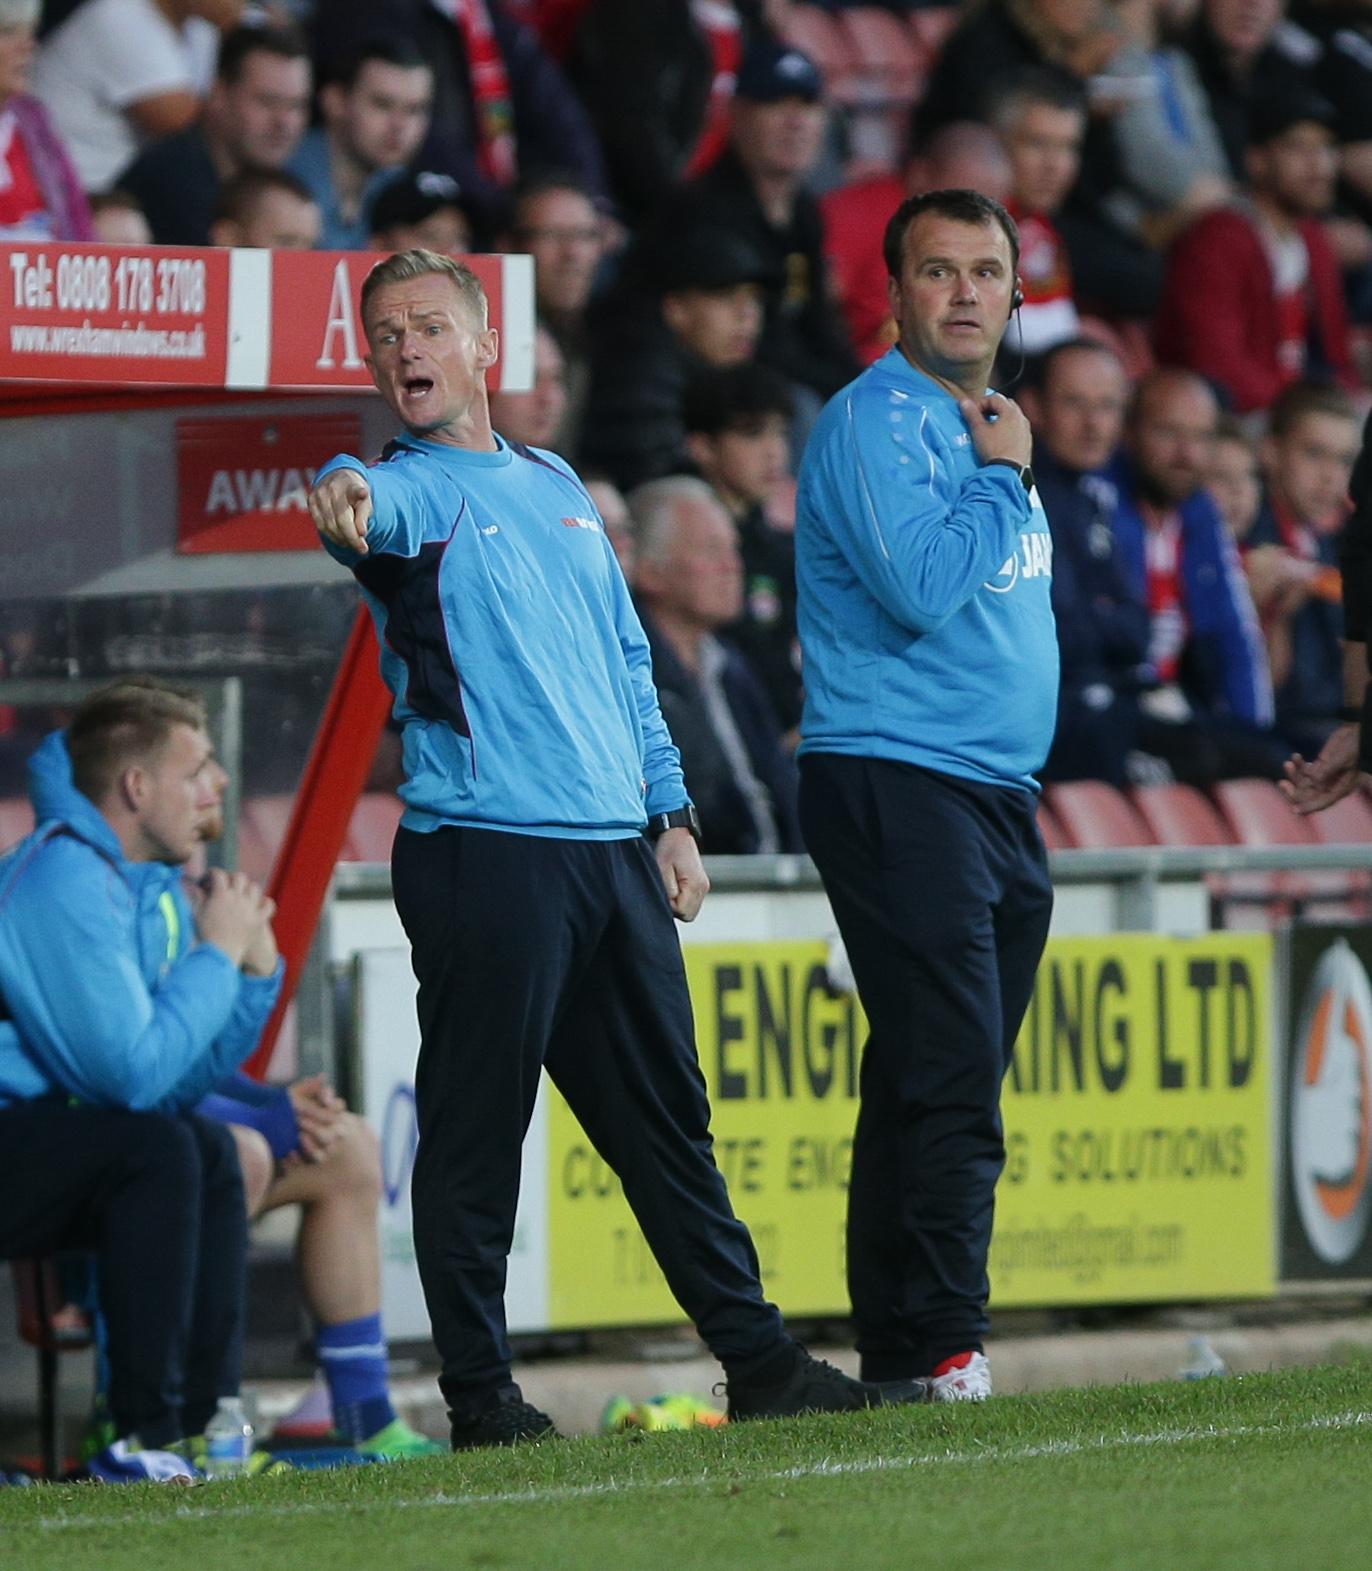 Live: Wrexham AFC v Harrogate Town - National League